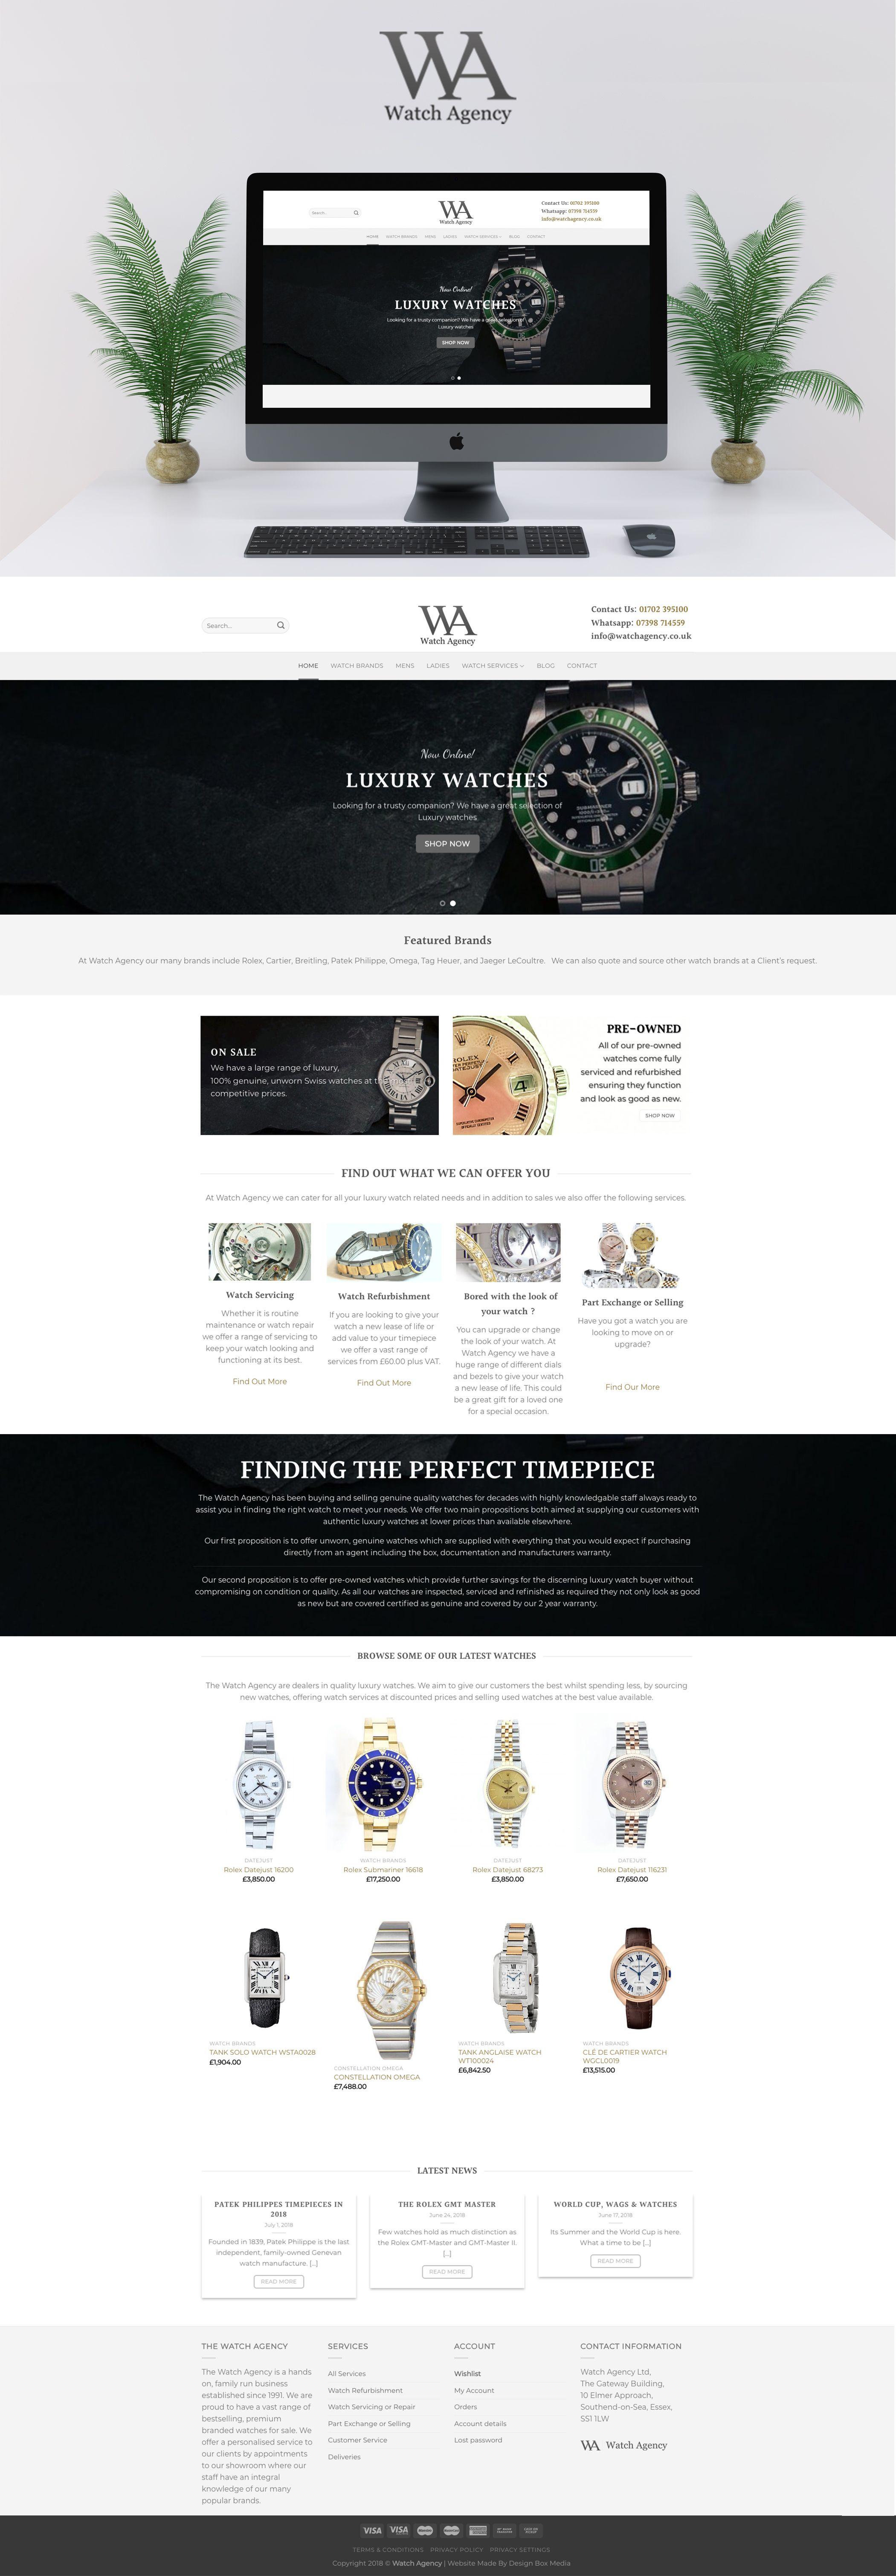 E Commerce Ecommerce Webdesign Website Watchwebsite Watches Watch Ecommercewebdesi Website Design Digital Marketing Digital Marketing Agency